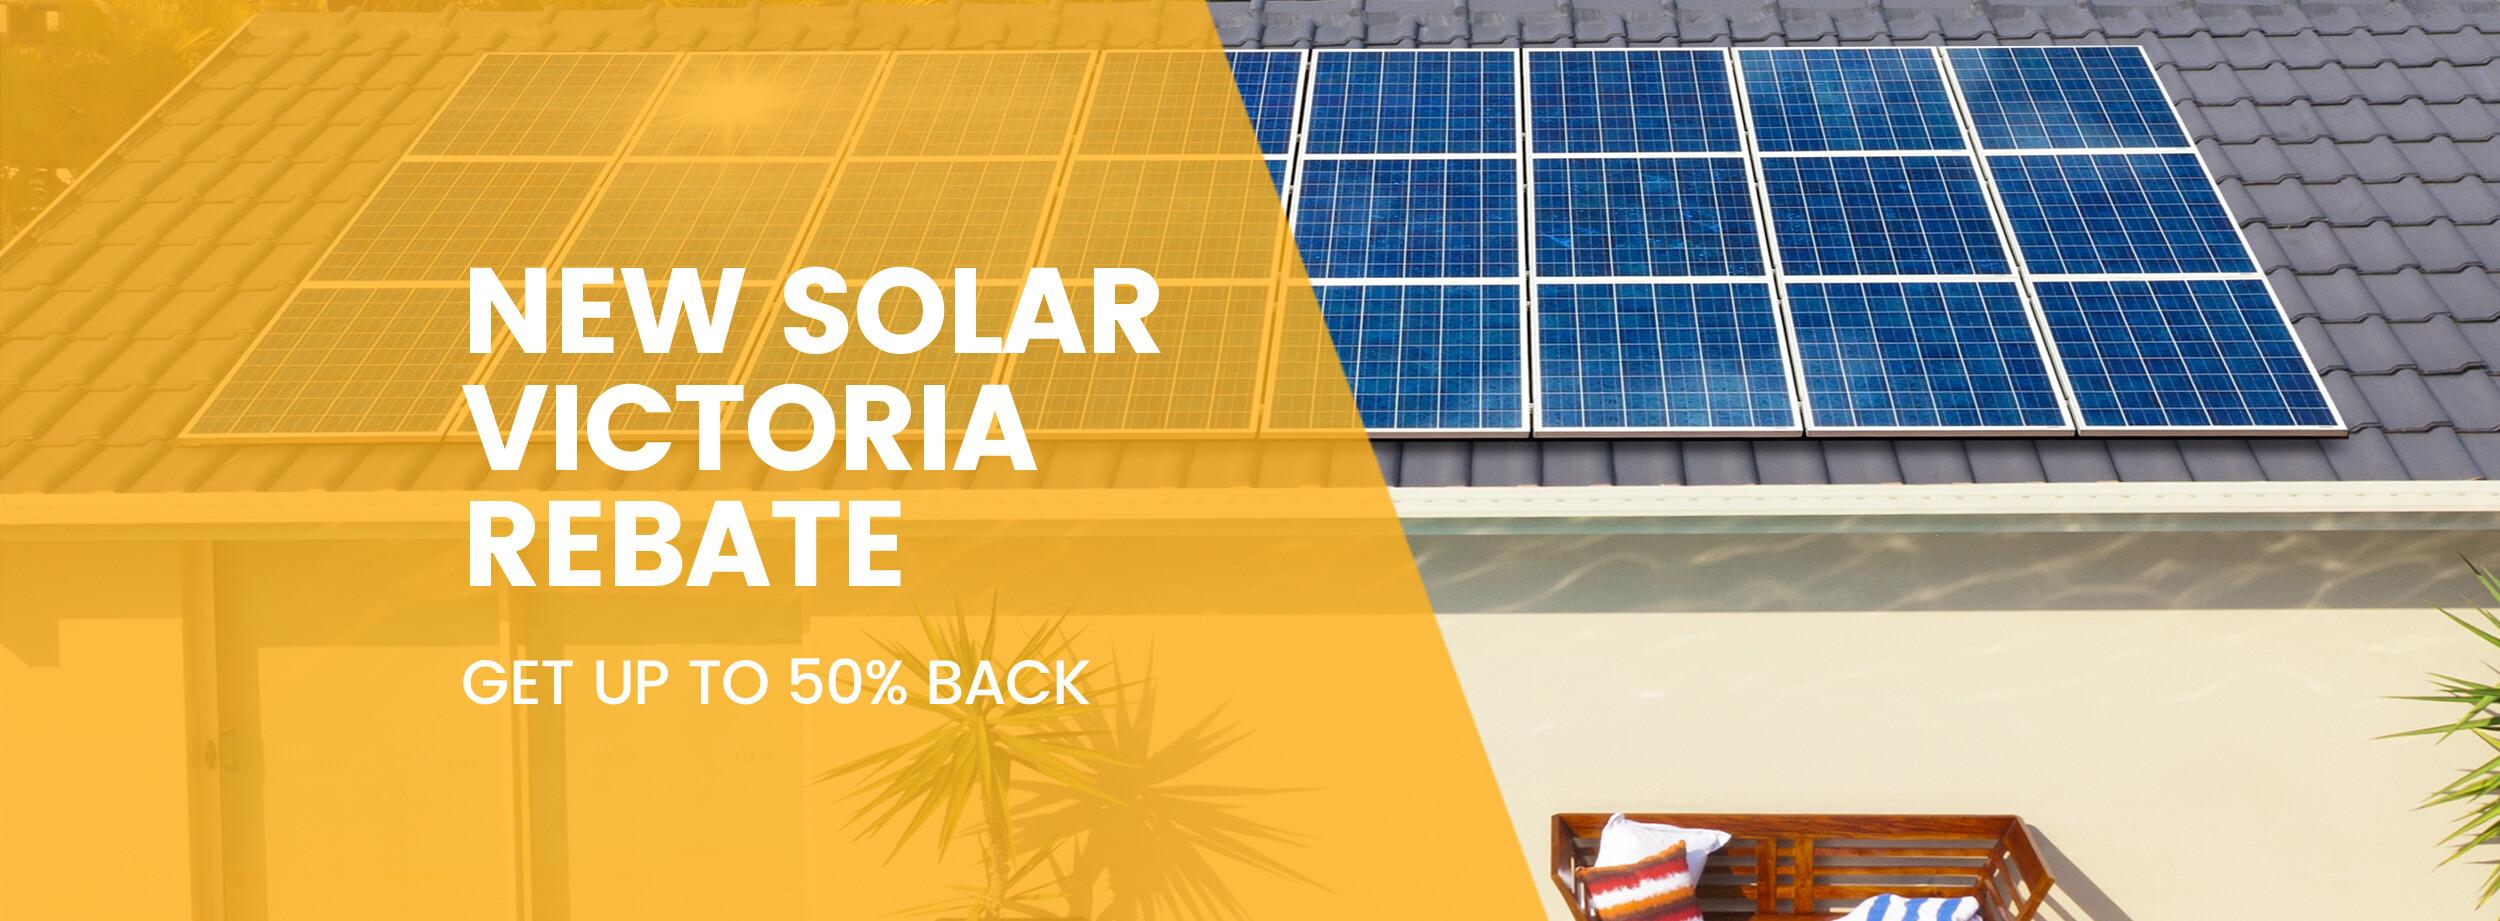 Victorian Solar Rebate